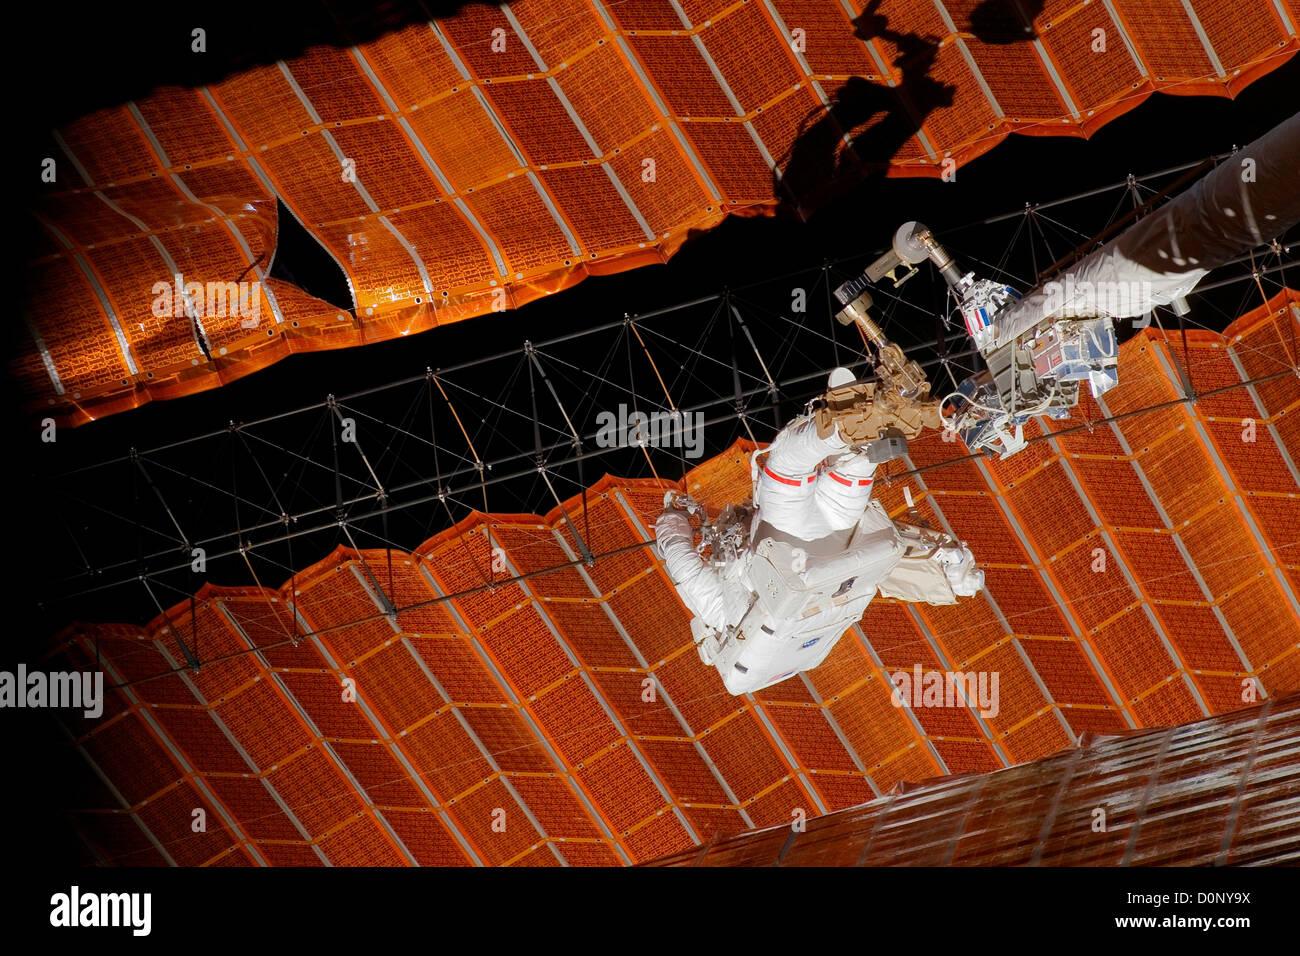 Repairing Solar Array - Stock Image